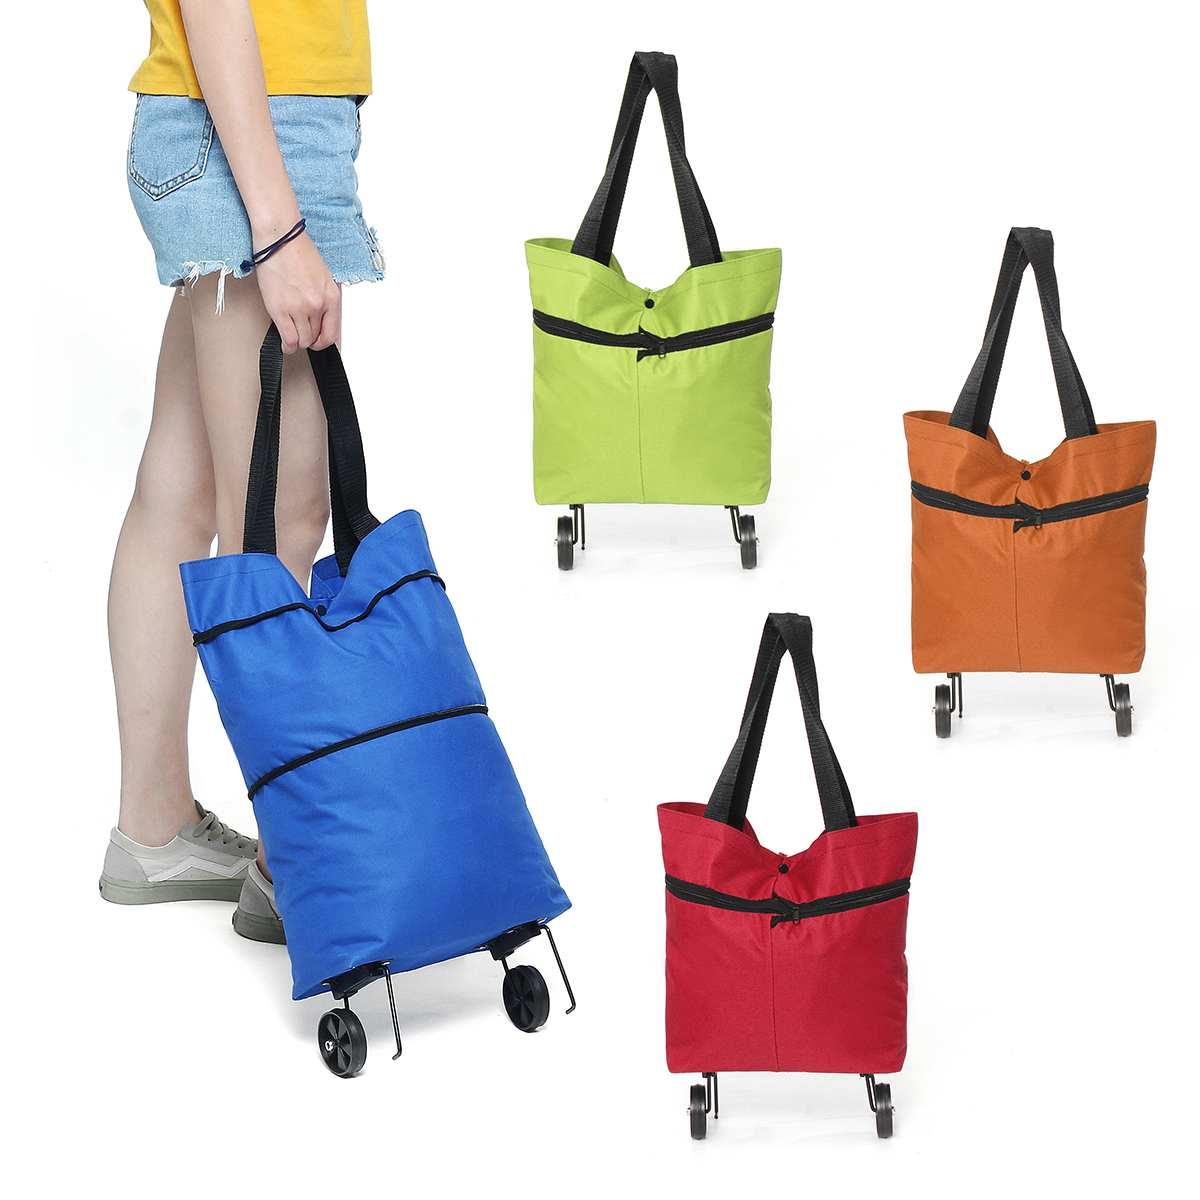 Osmond FoldiShopping Bag Shopping Cart On Wheels Bag Small Pull Cart Women Buy Vegetables Bag Shopping Organizer Tug Package 5.0